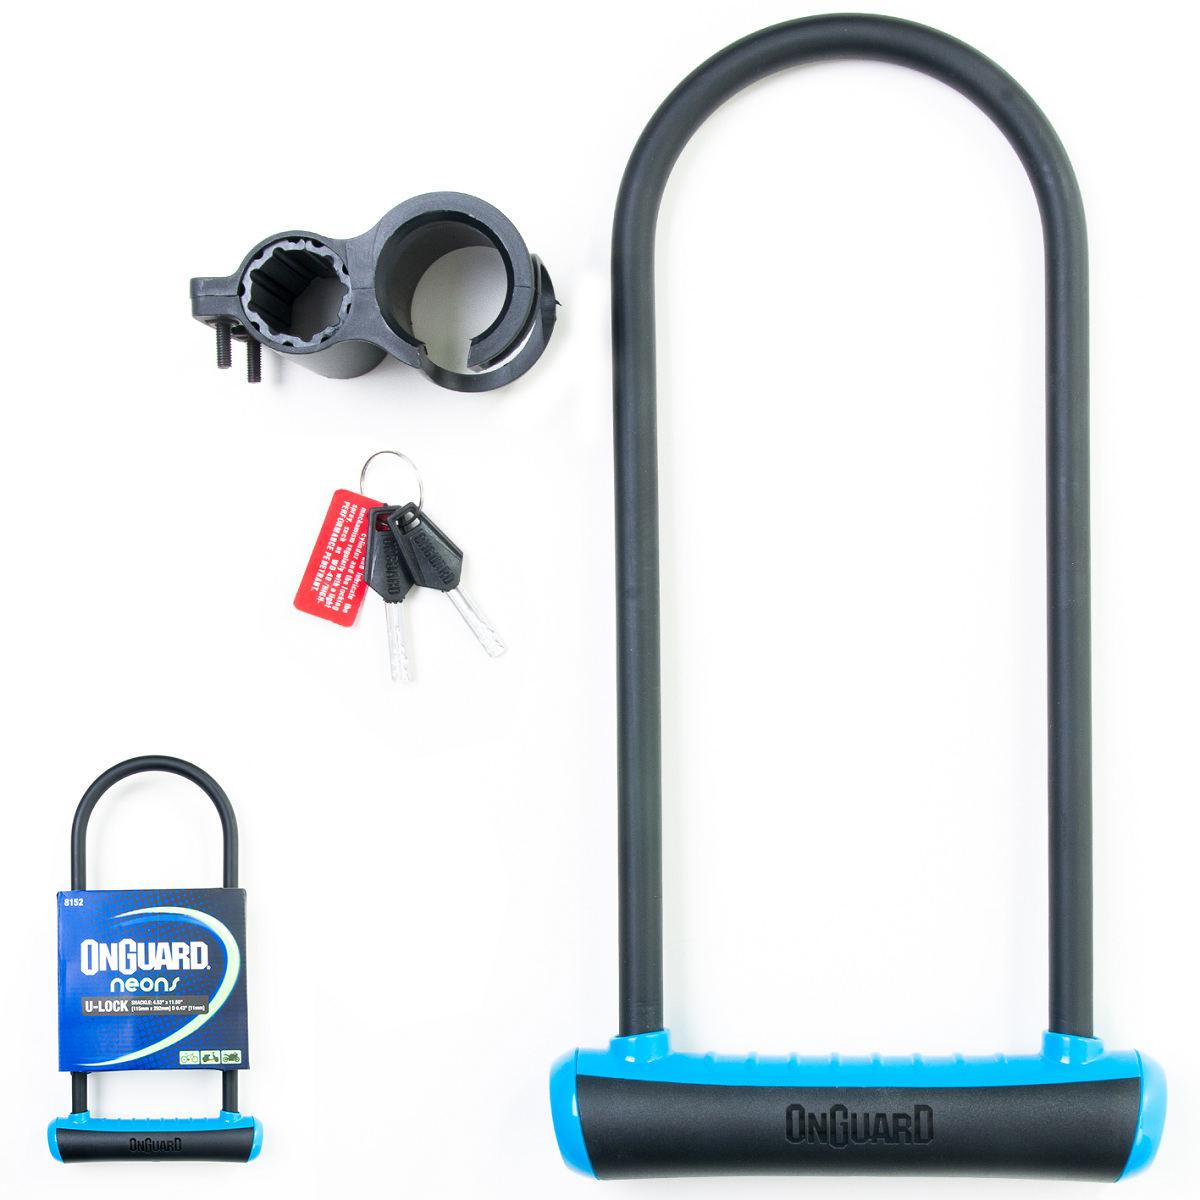 Cadeado Onguard Neon 8152 Trava U-lock P/ Bicicleta